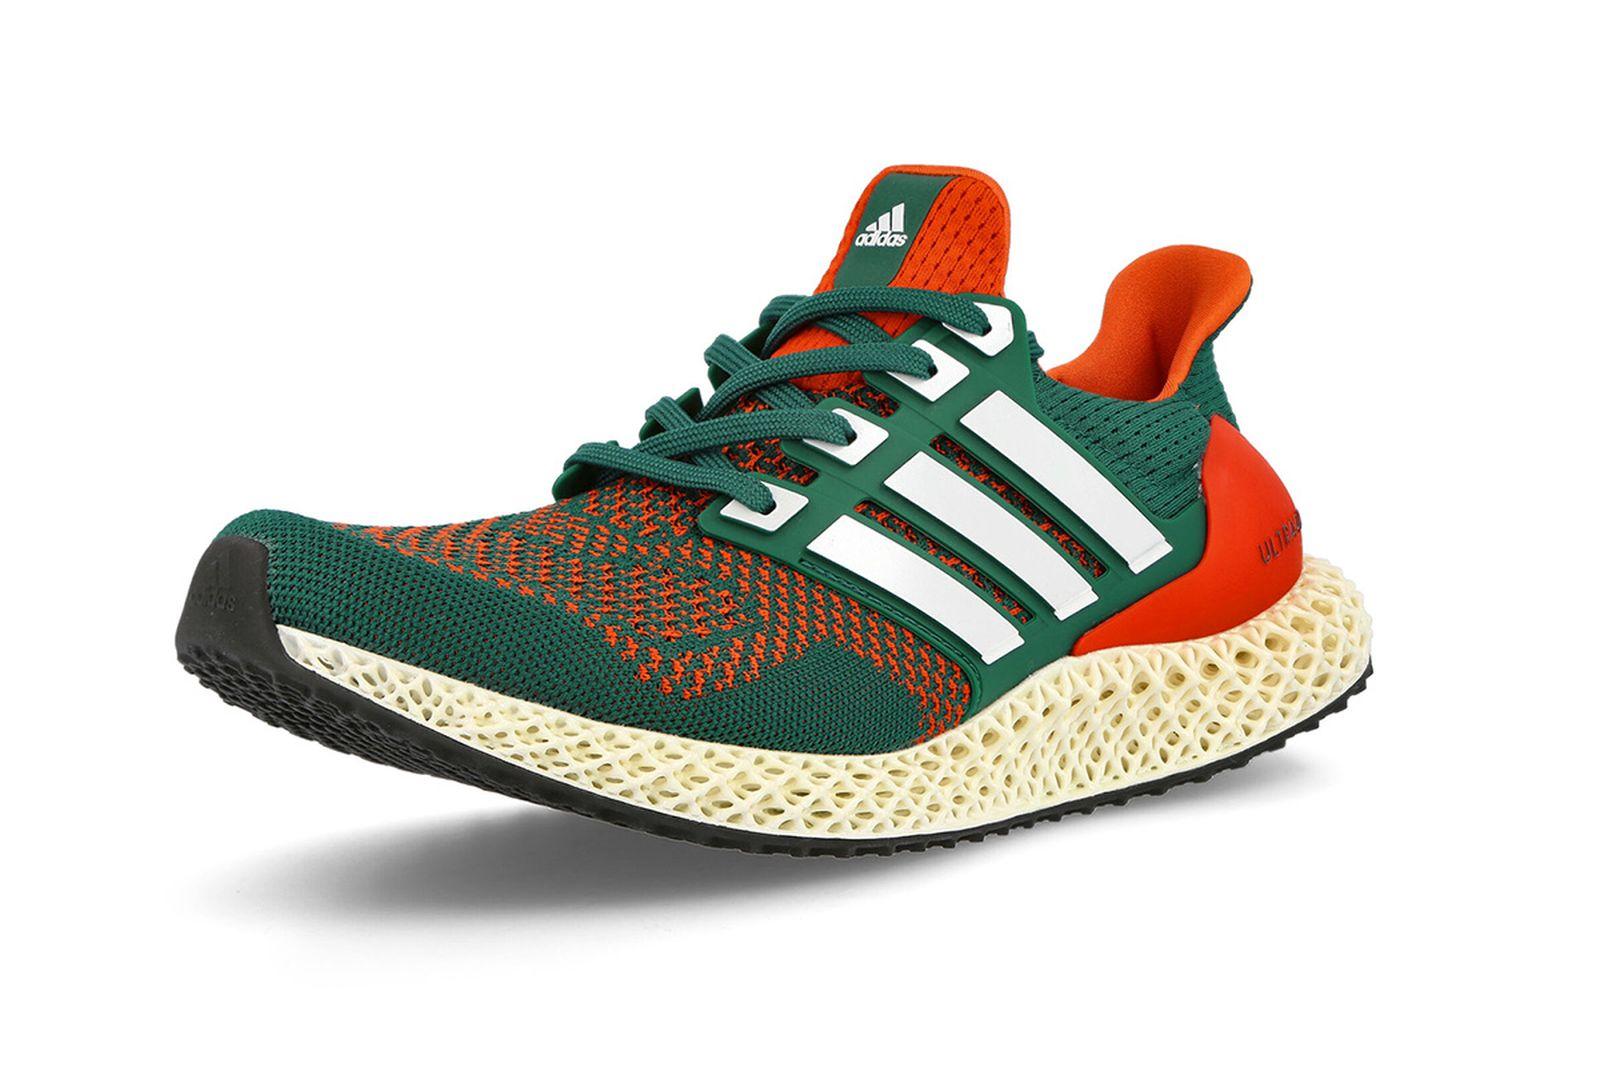 adidas-ultra4d-miami-release-date-price-03